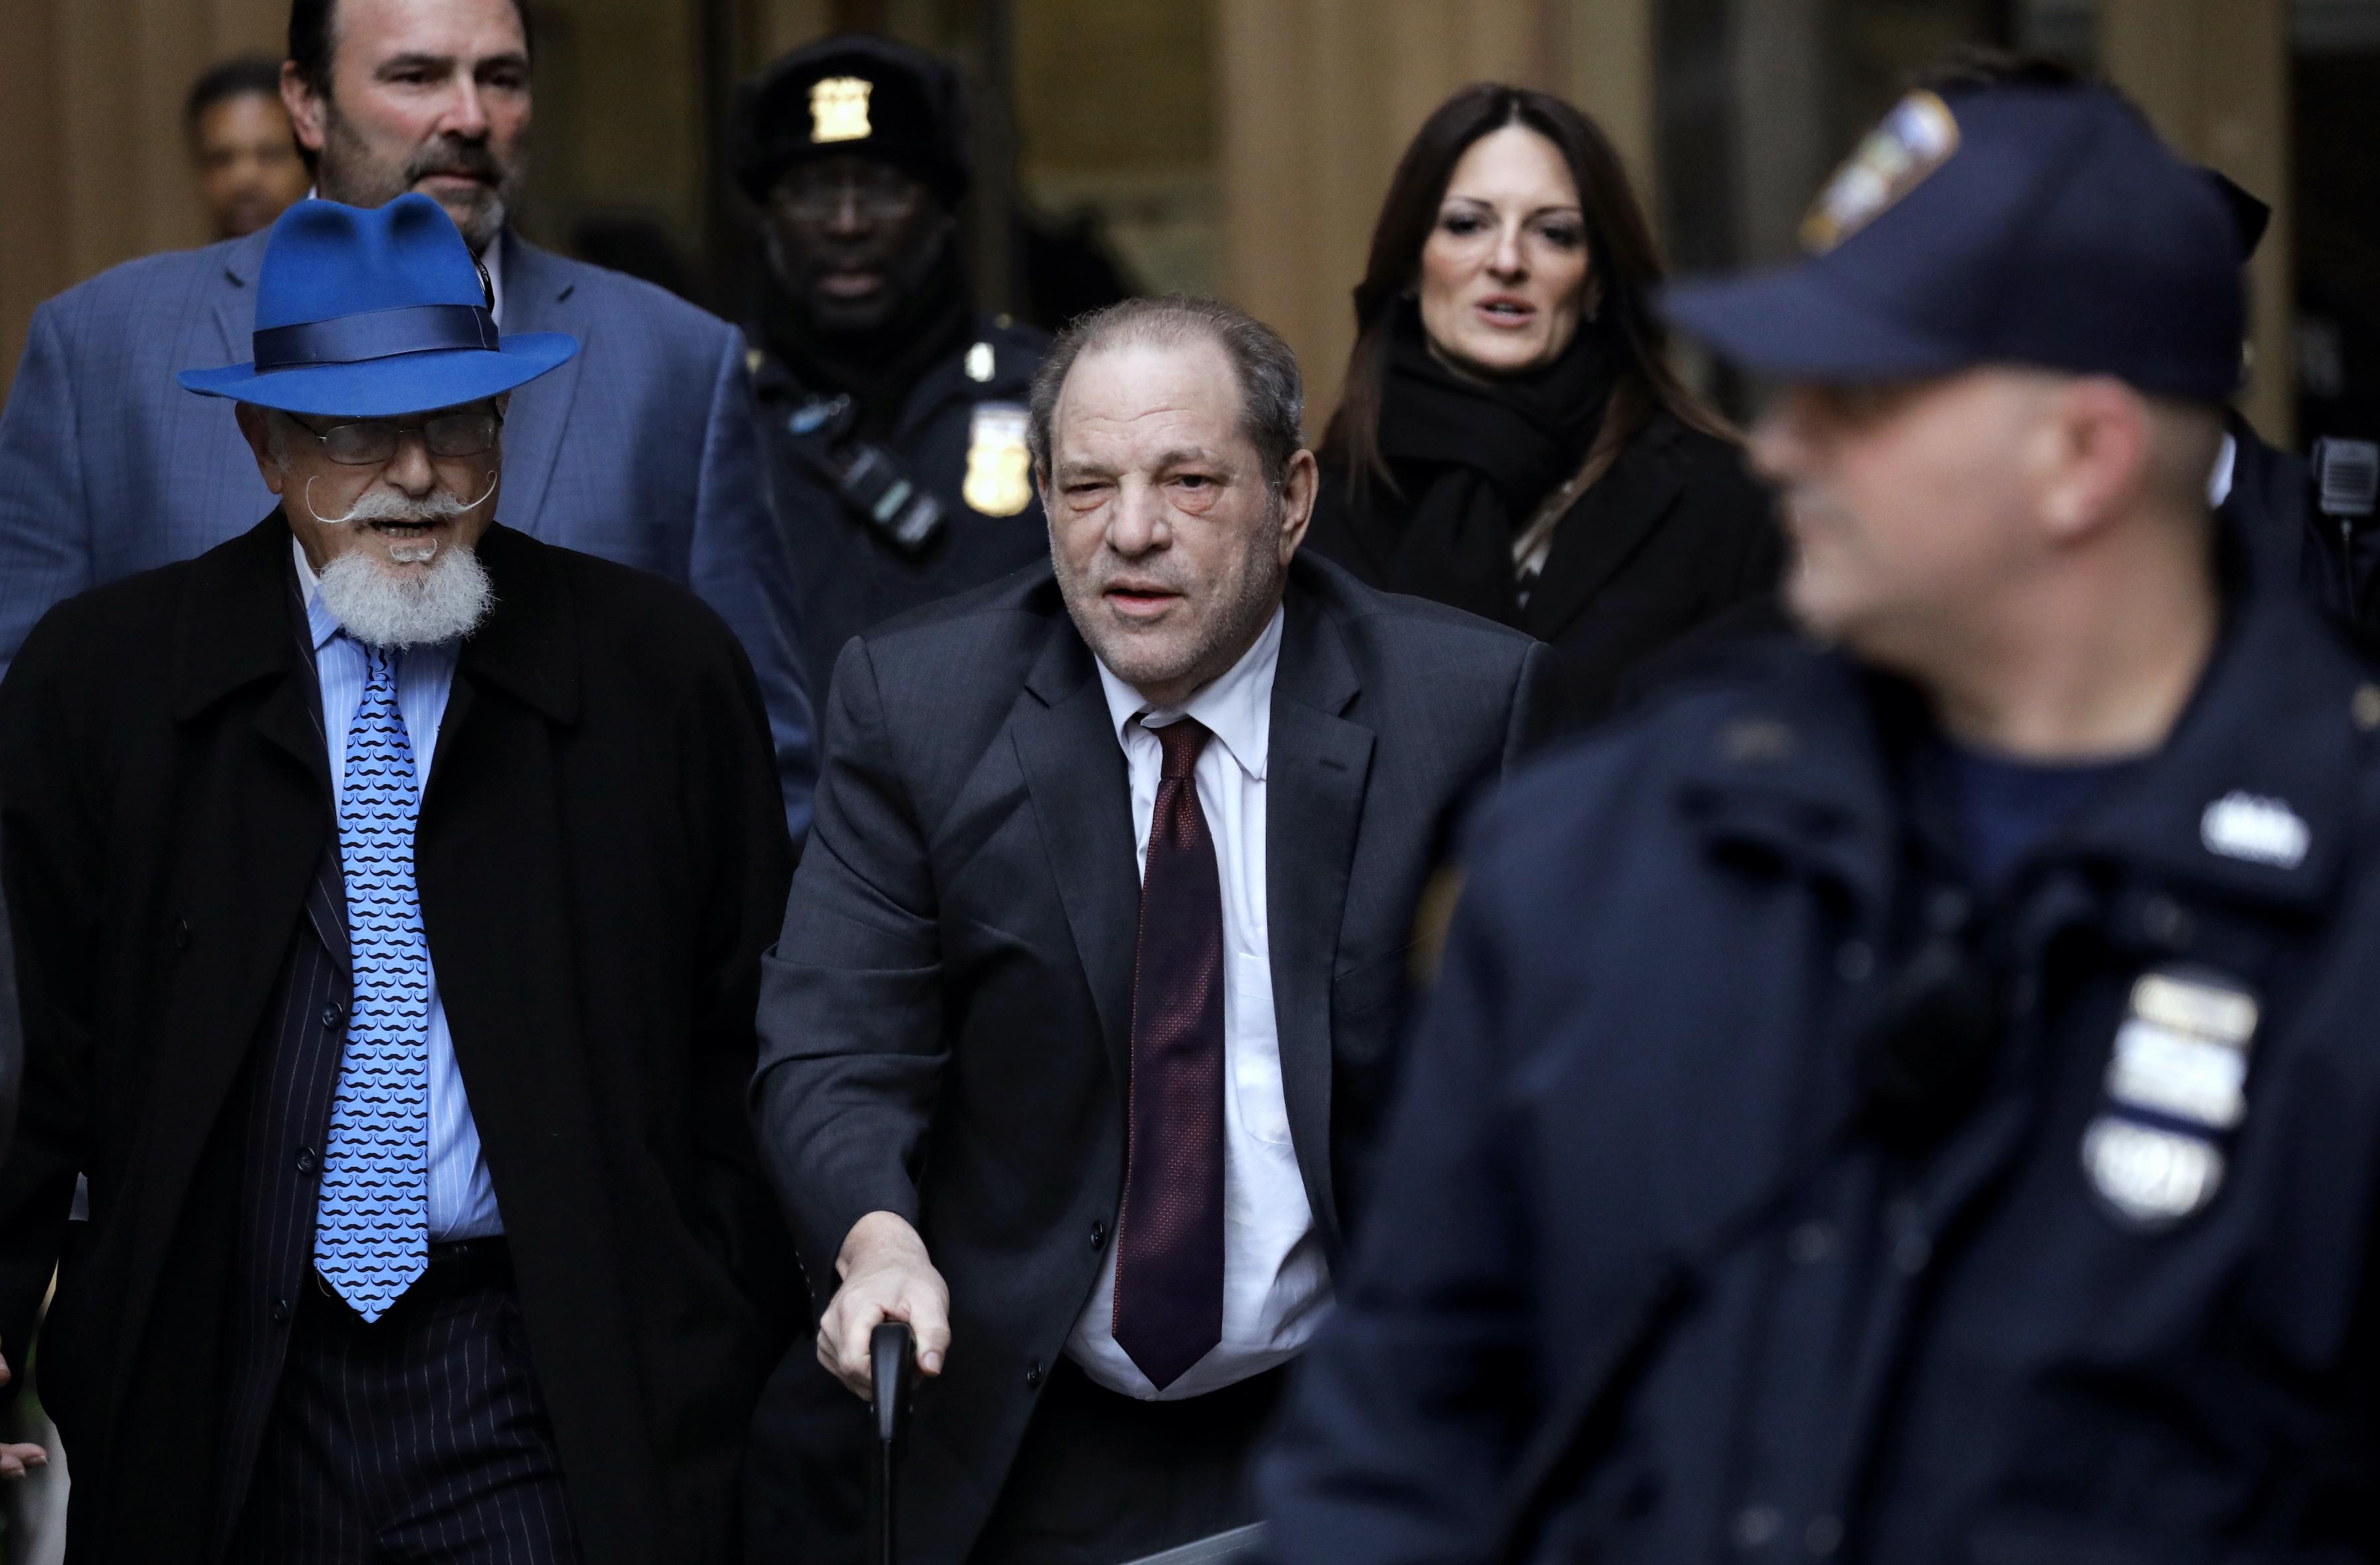 Harvey Weinstein leaves court in New York on Feb. 20, 2020.